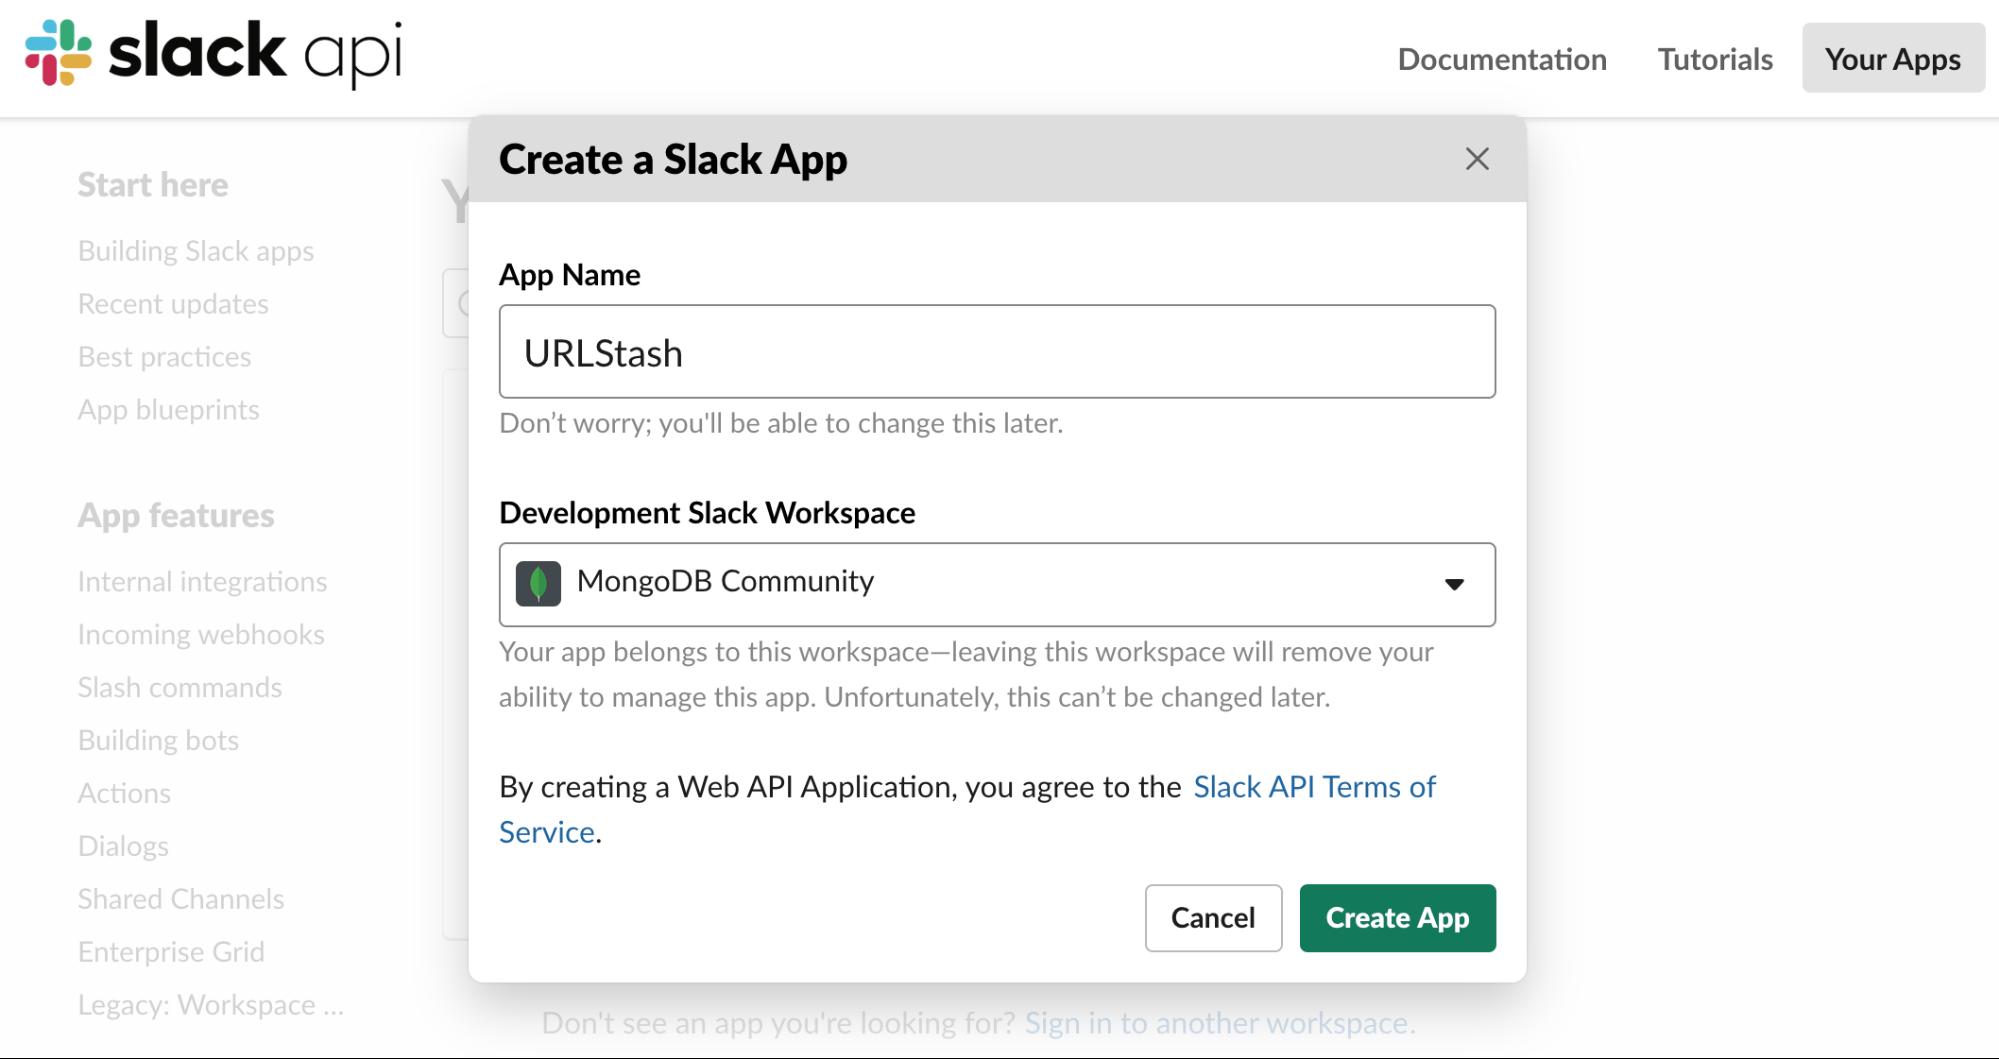 Creating a Slack Application